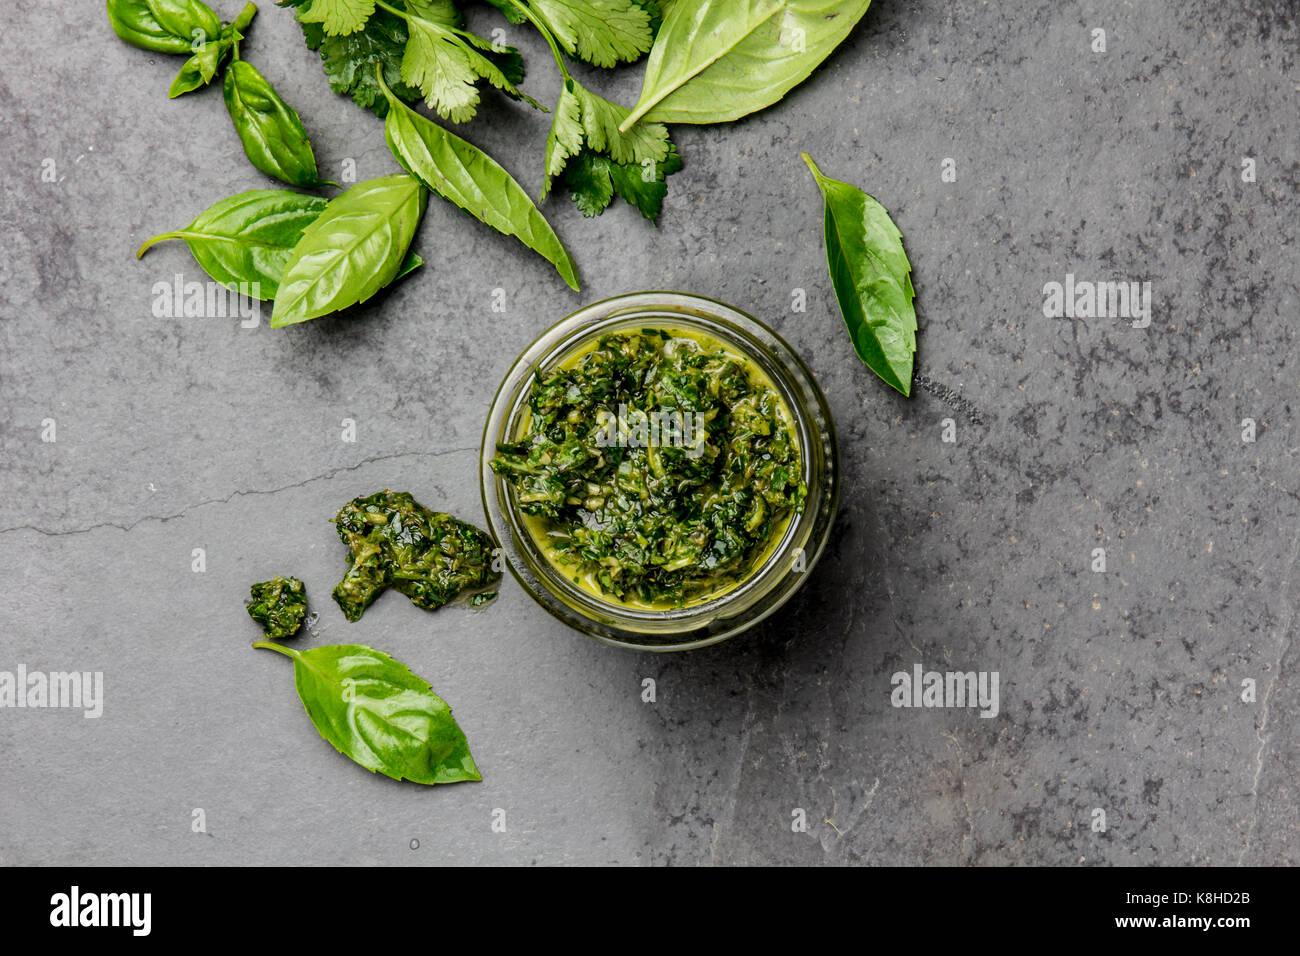 Chimichurri sauce. Argentine green parsley basil sauce chimichurri for barbecue asado in glass jar, gray slate background. Stock Photo